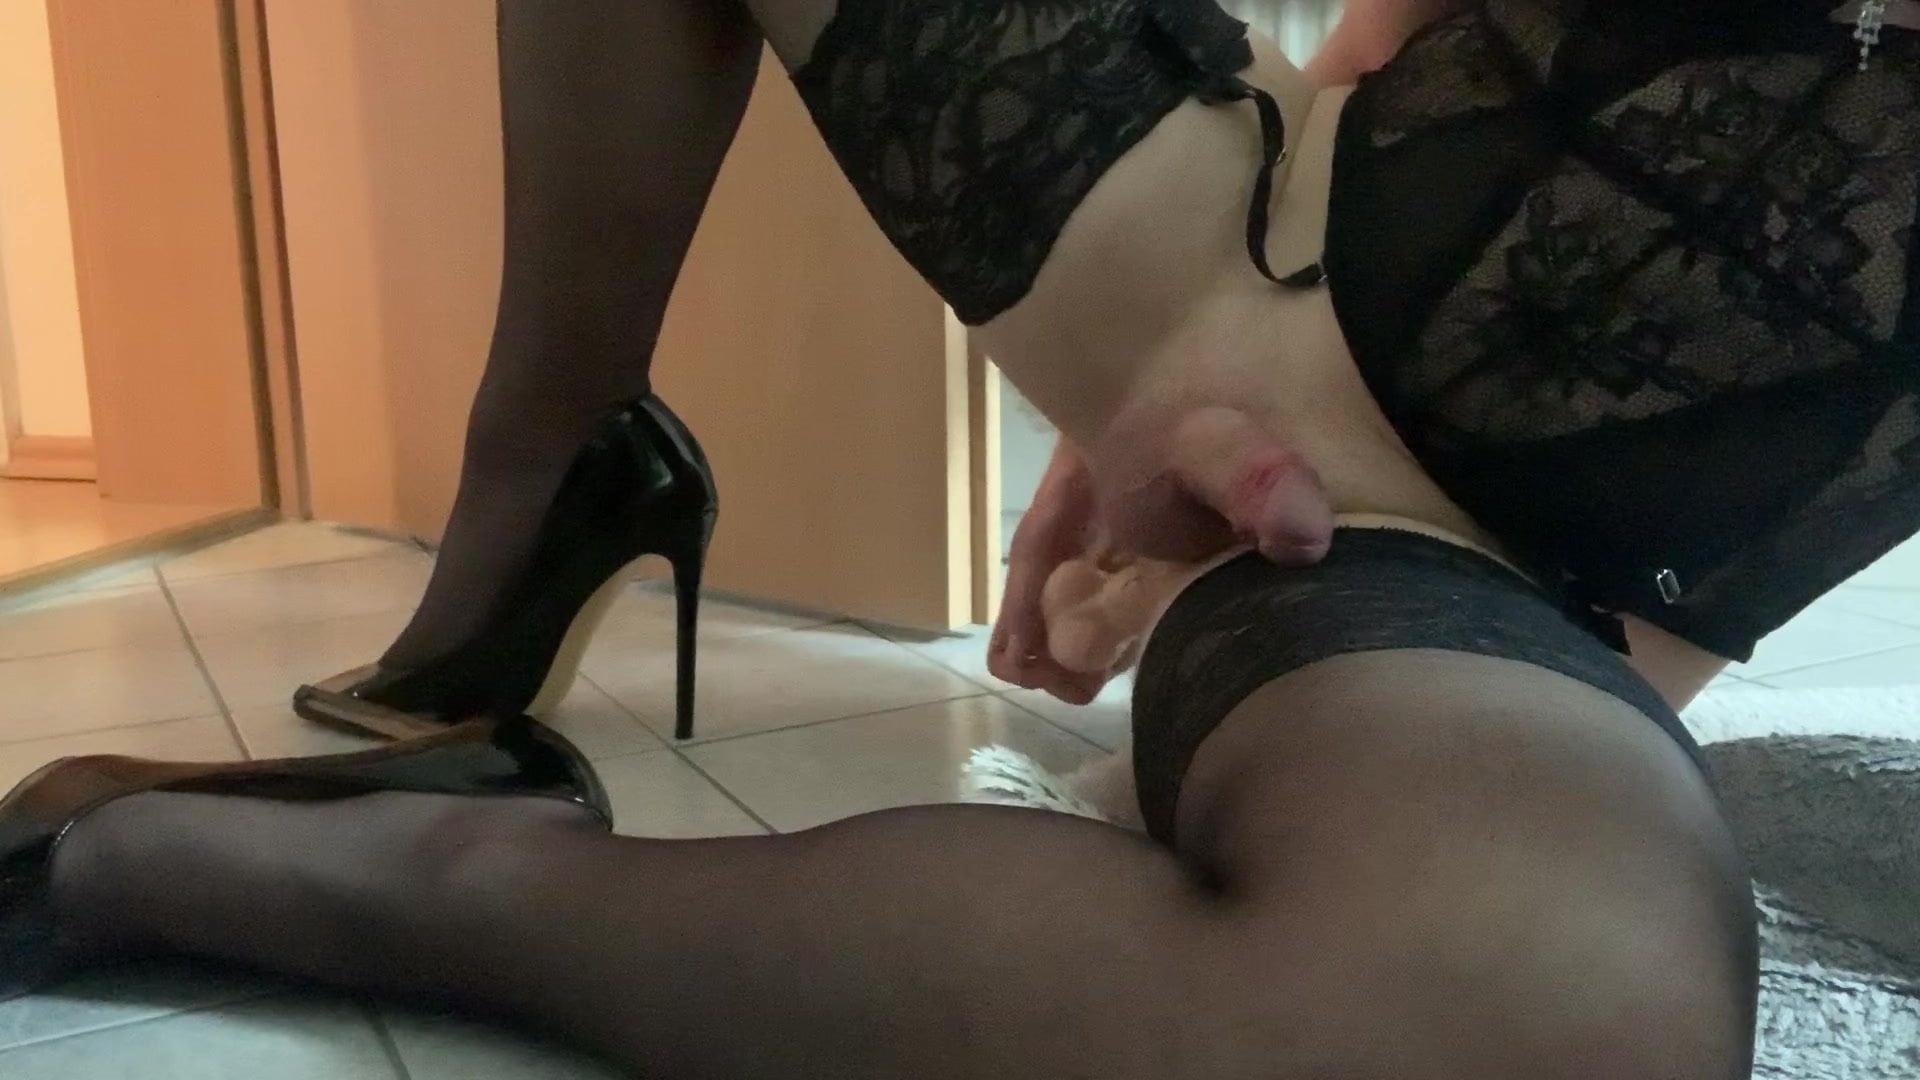 Reiten Cumming Dildo Während Huge dildo